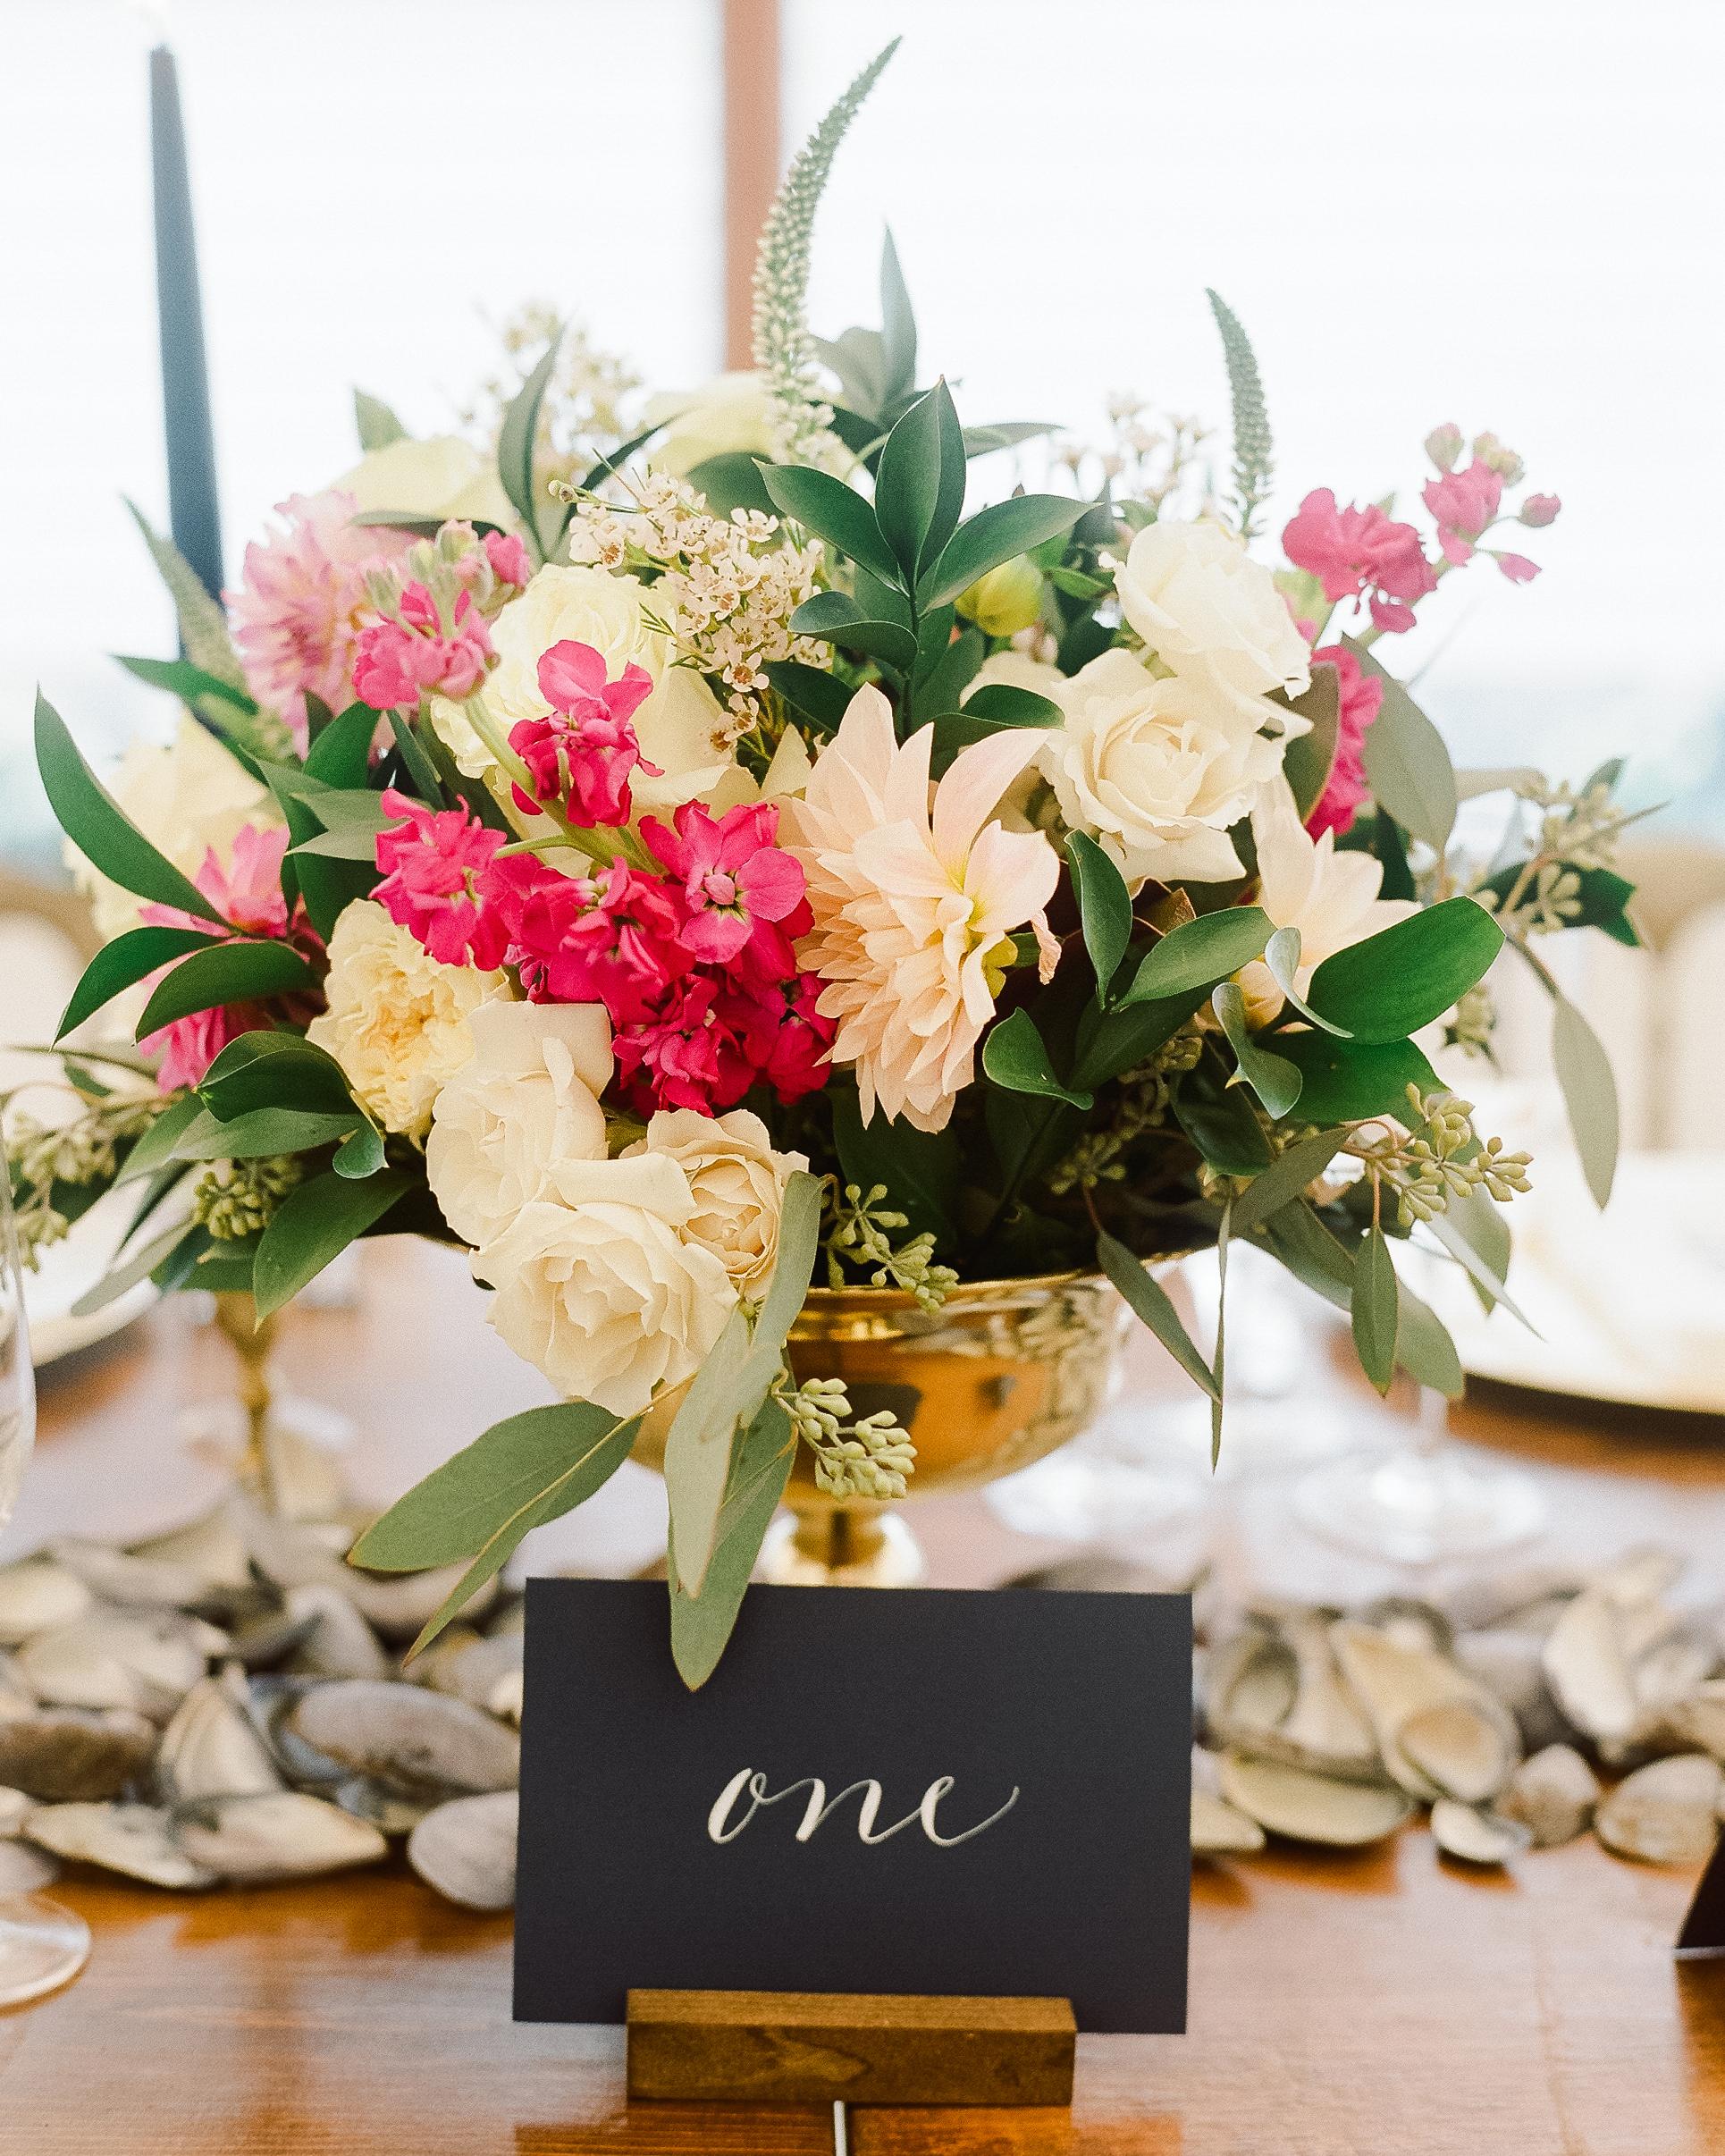 lindsay-garrett-wedding-centerpiece-0765-s111850-0415.jpg